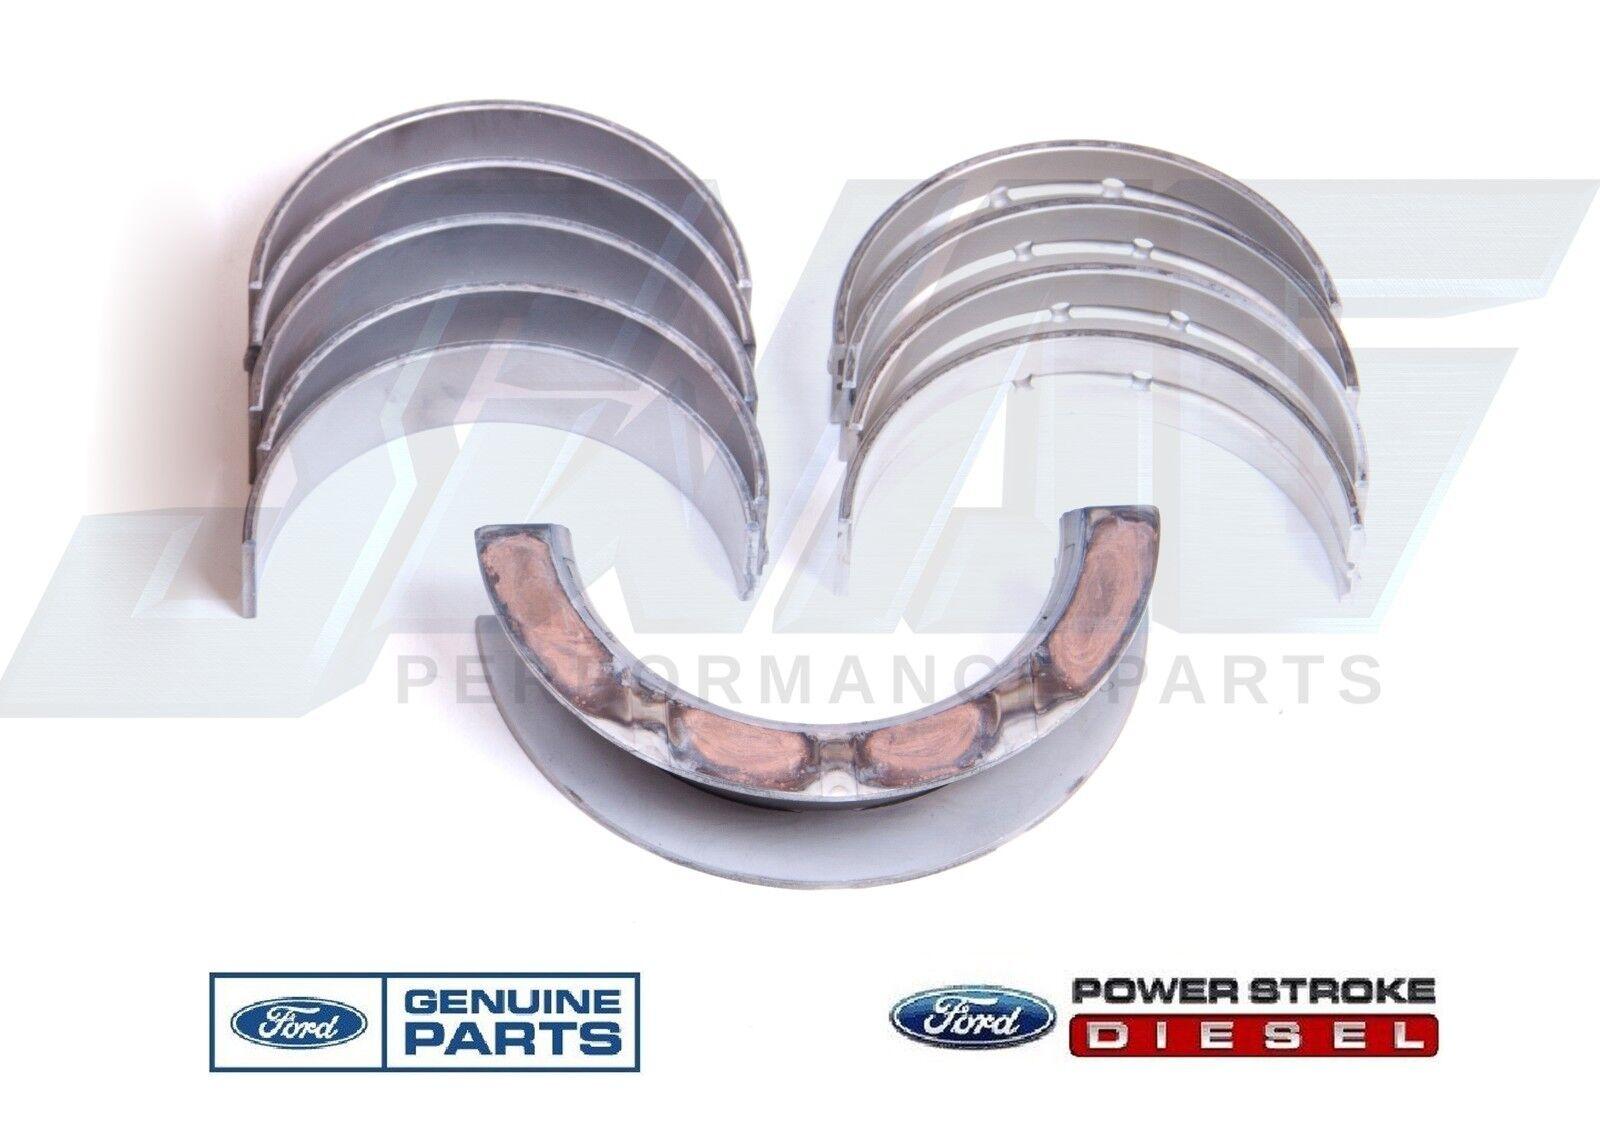 Clevite Rod Bearing Set 8 STD bearings 2008-2010 Ford 6.4 6.4L Powerstroke